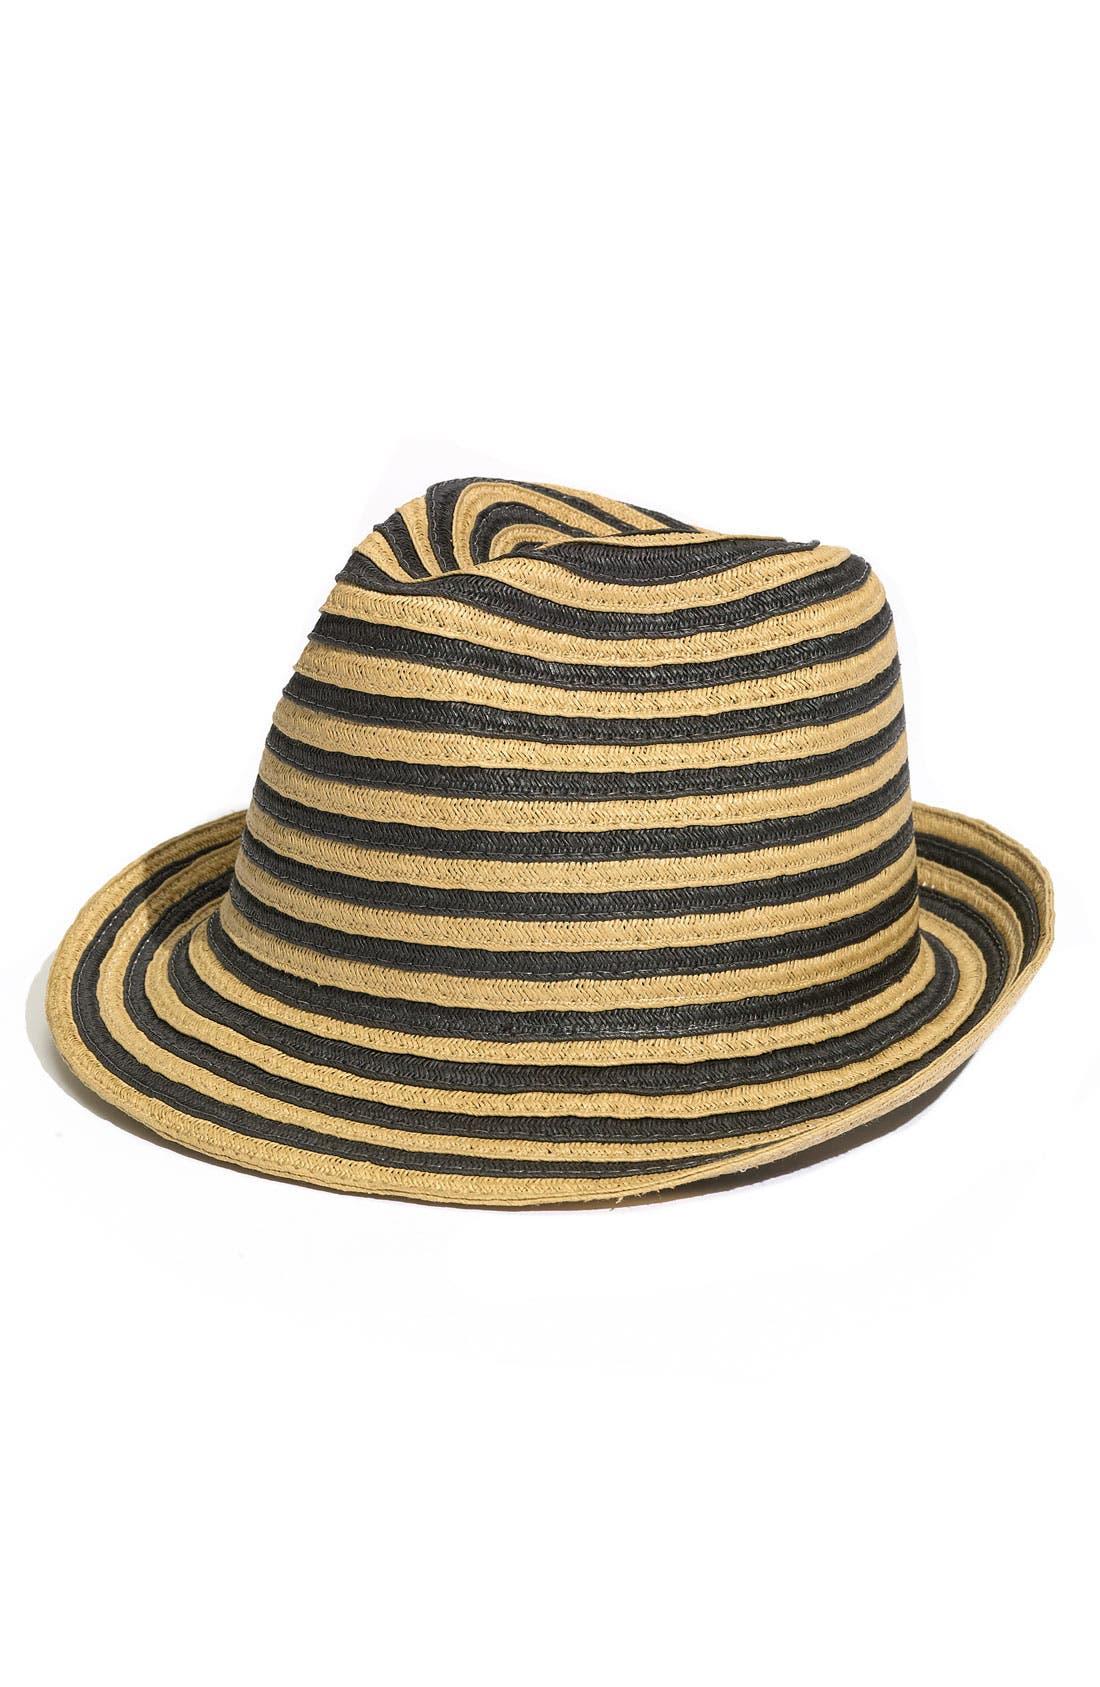 Main Image - Sonia Rykiel 'Capeline' Straw Hat